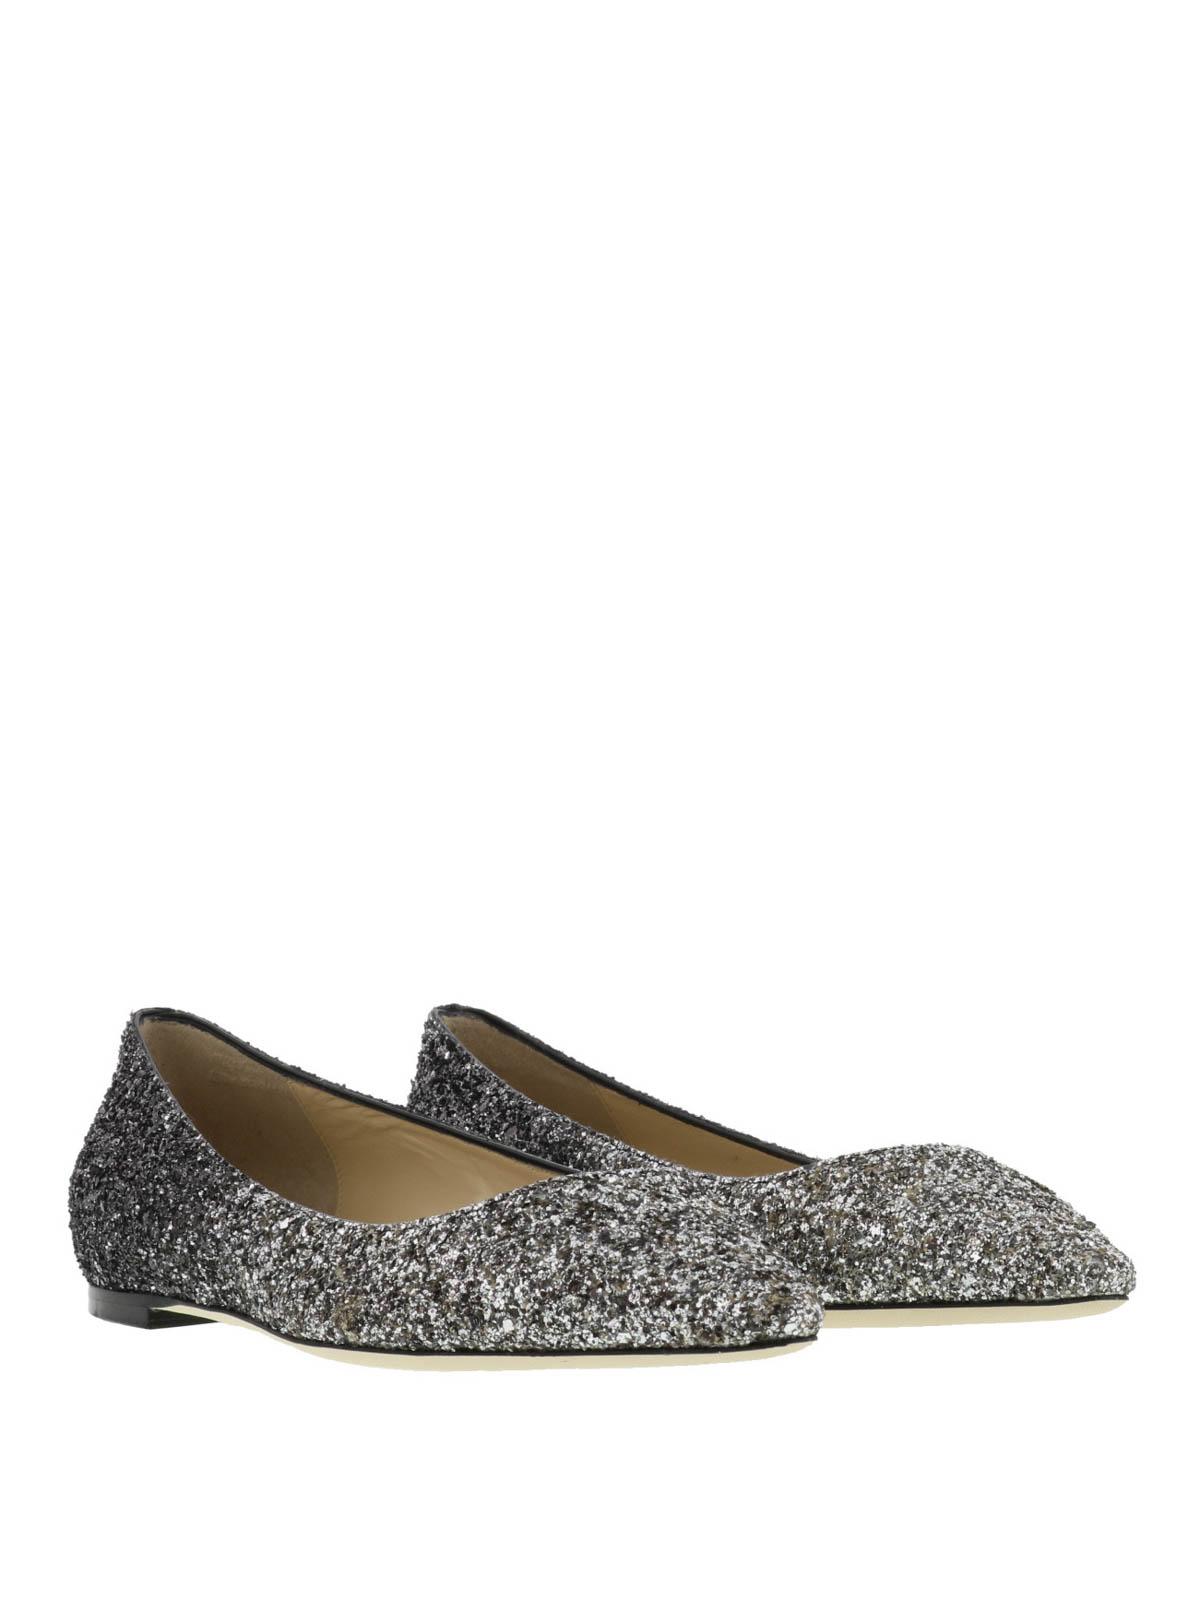 7a7ad5988873 JIMMY CHOO  flat shoes online - Romy faded glitter ballerinas